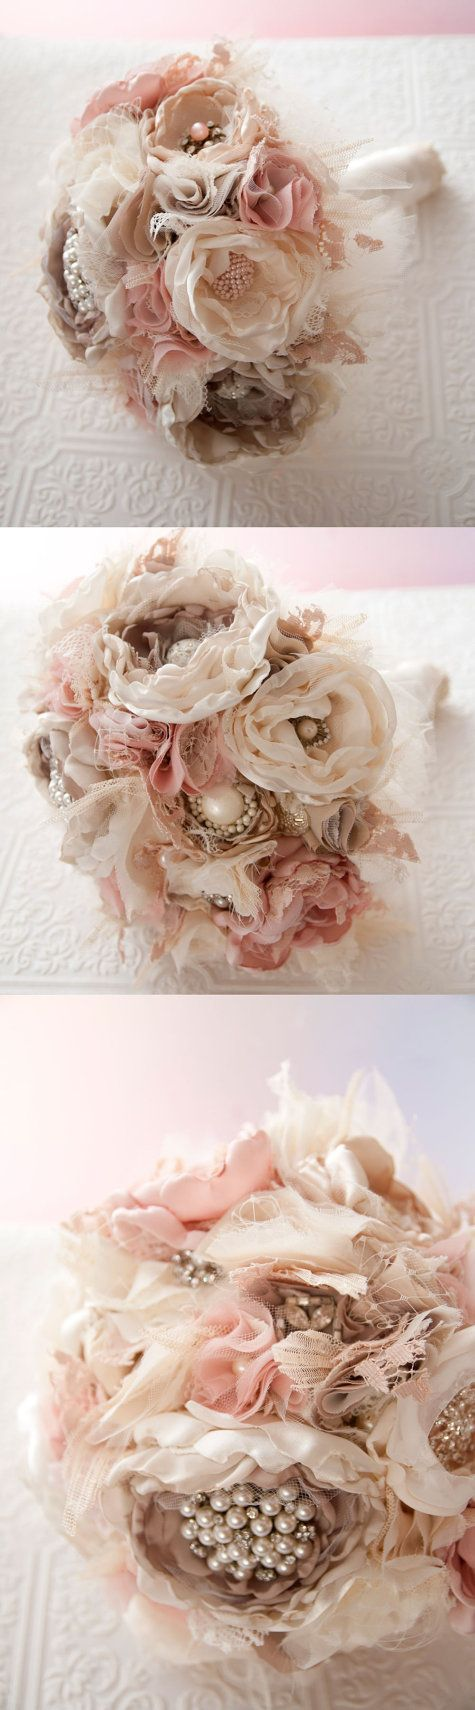 Best wedding images on pinterest weddings